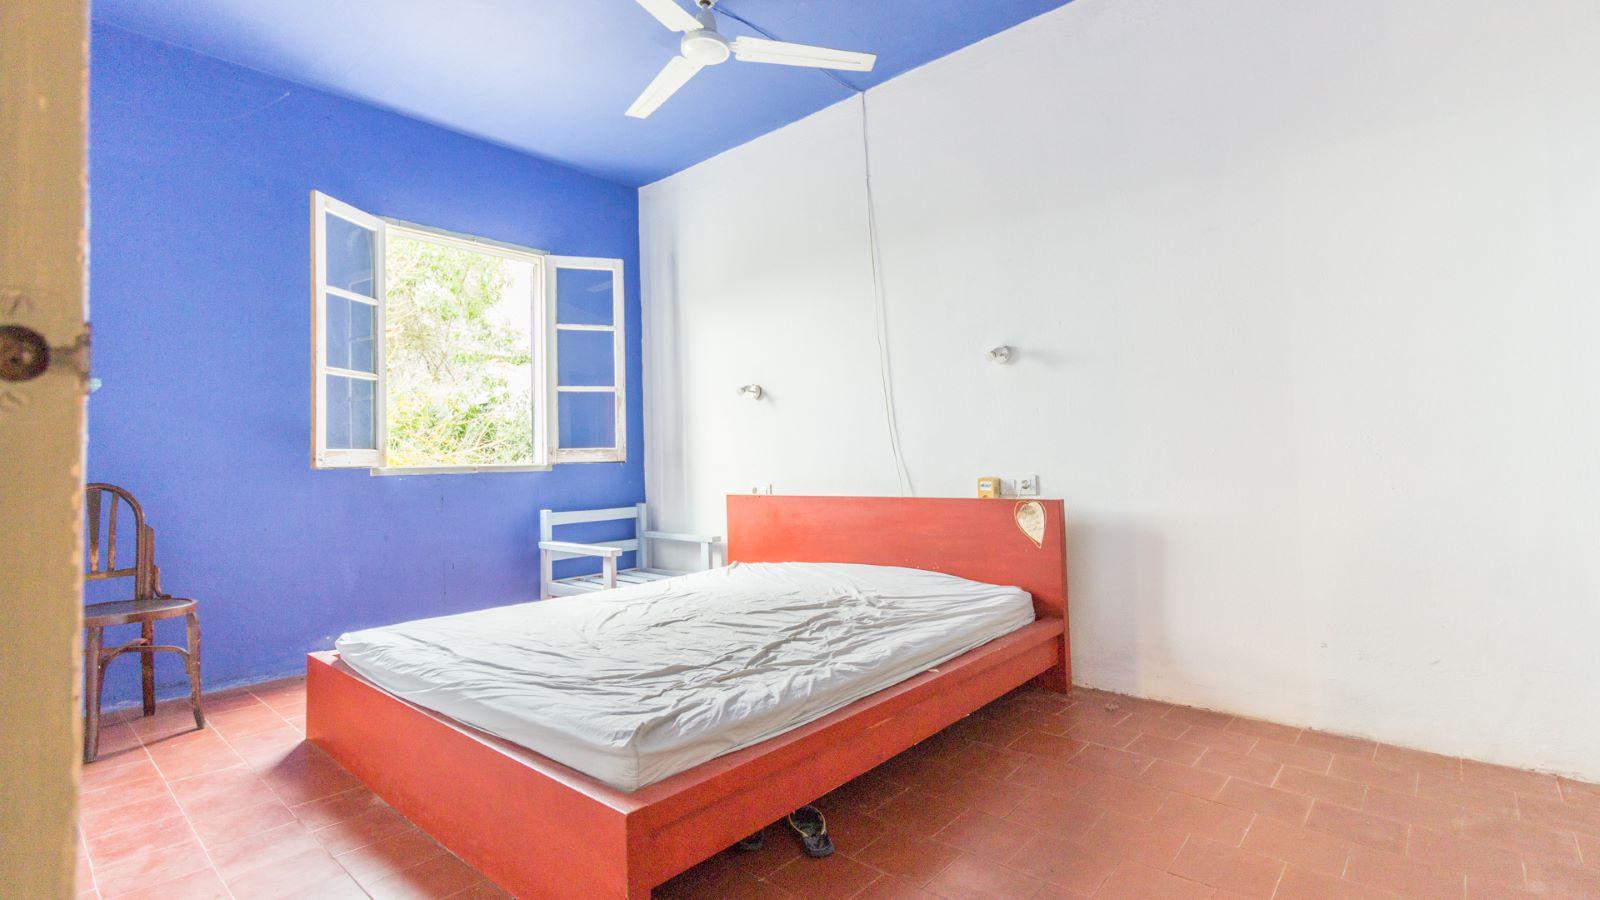 Country house in Ciutadella Ref: S2513 67